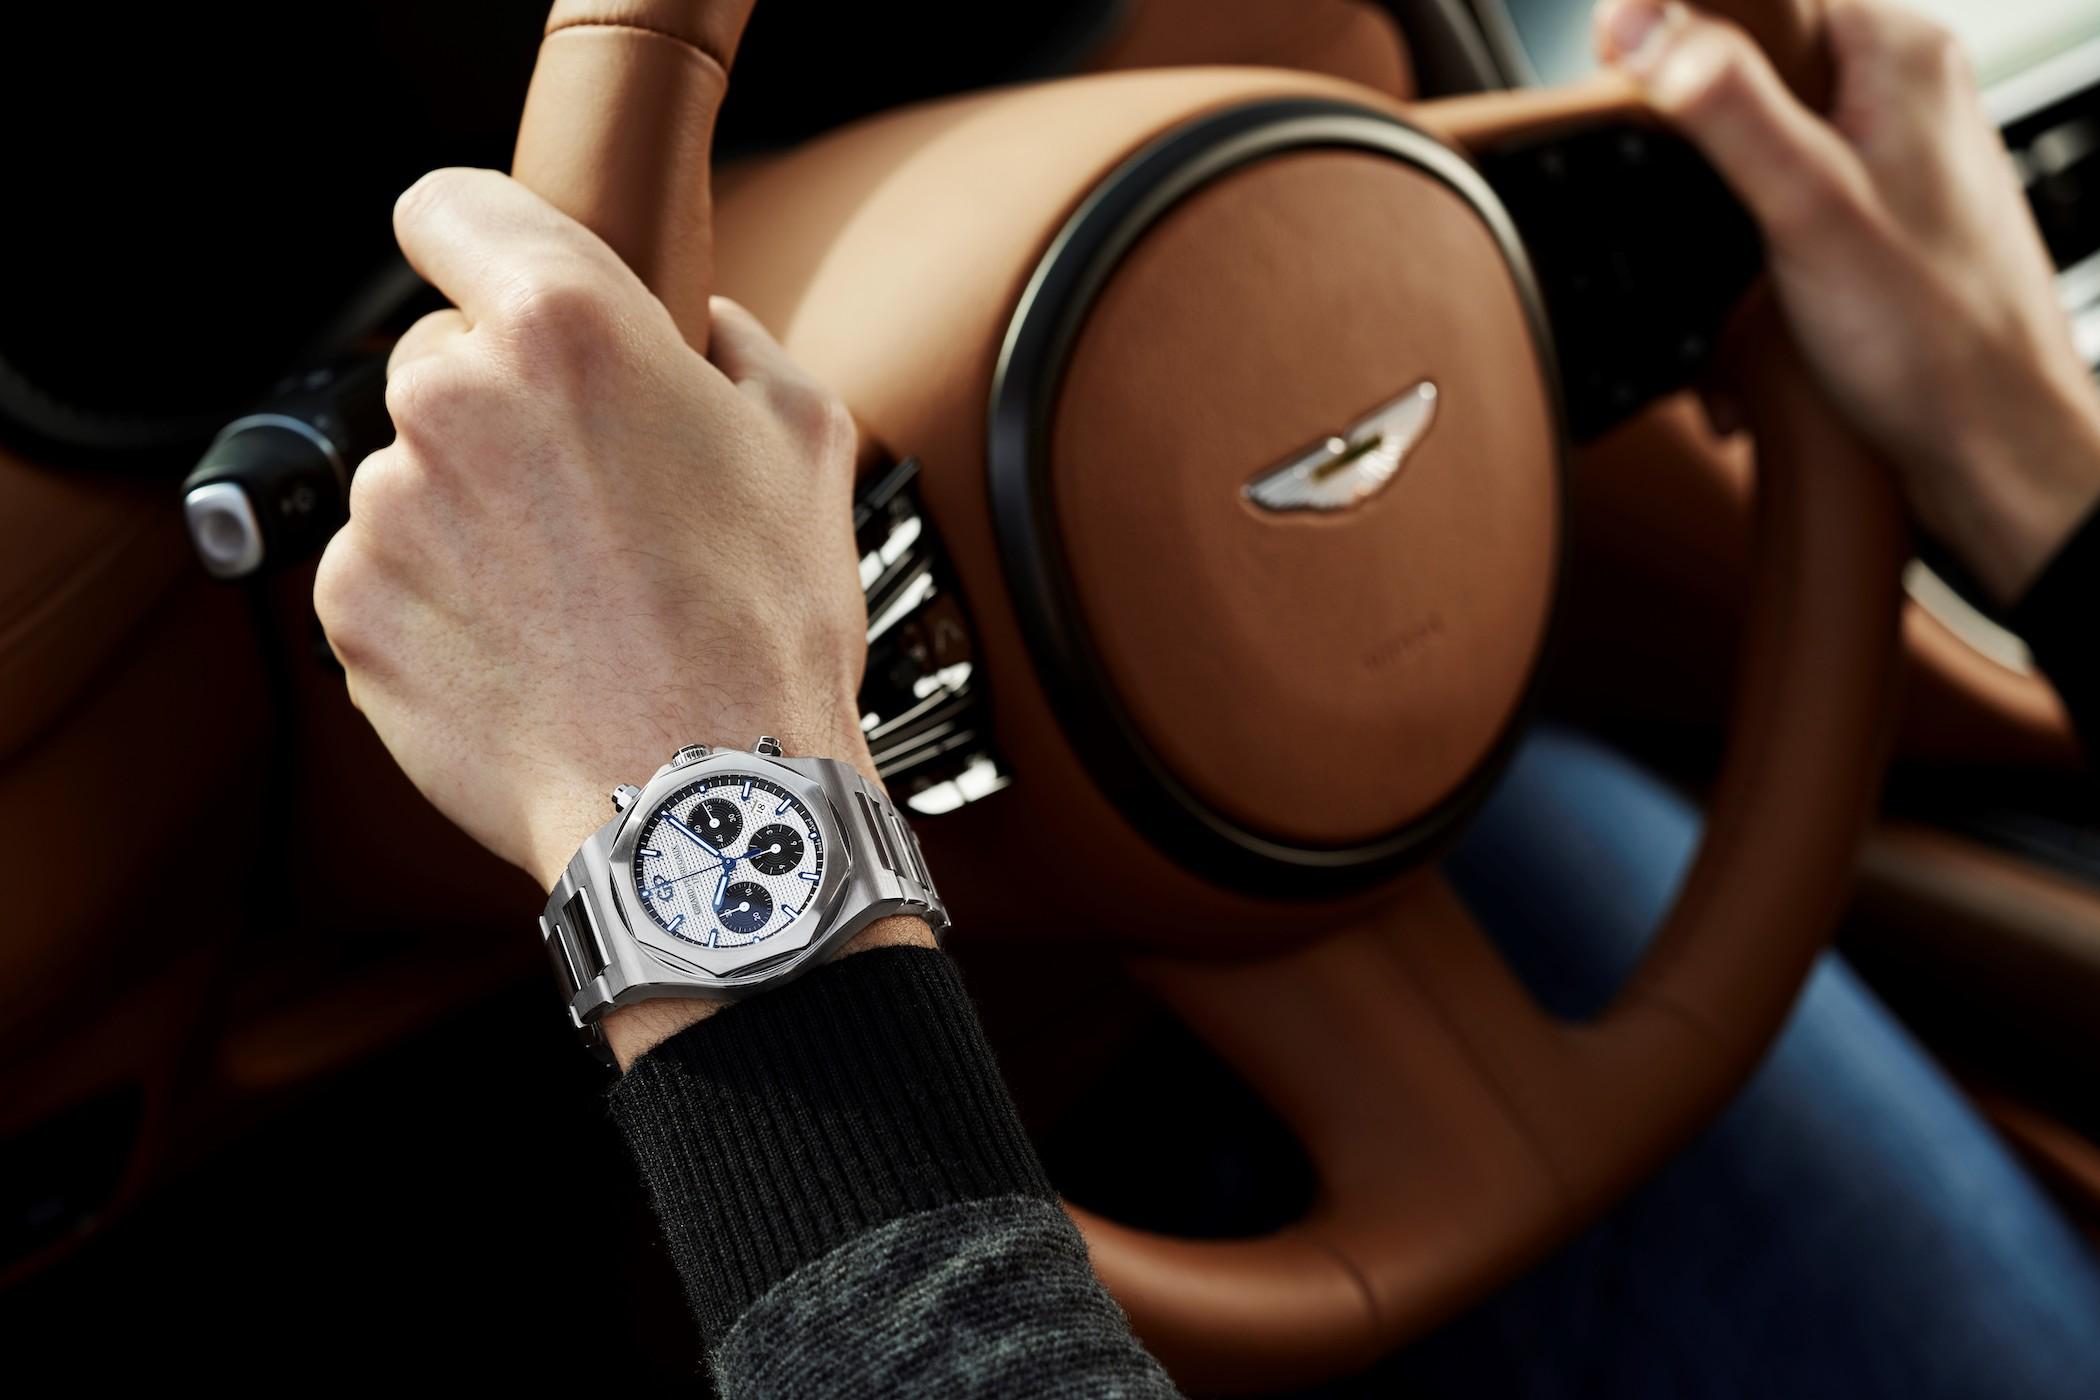 Girard-Perregaux x Aston Martin partnership (2021)